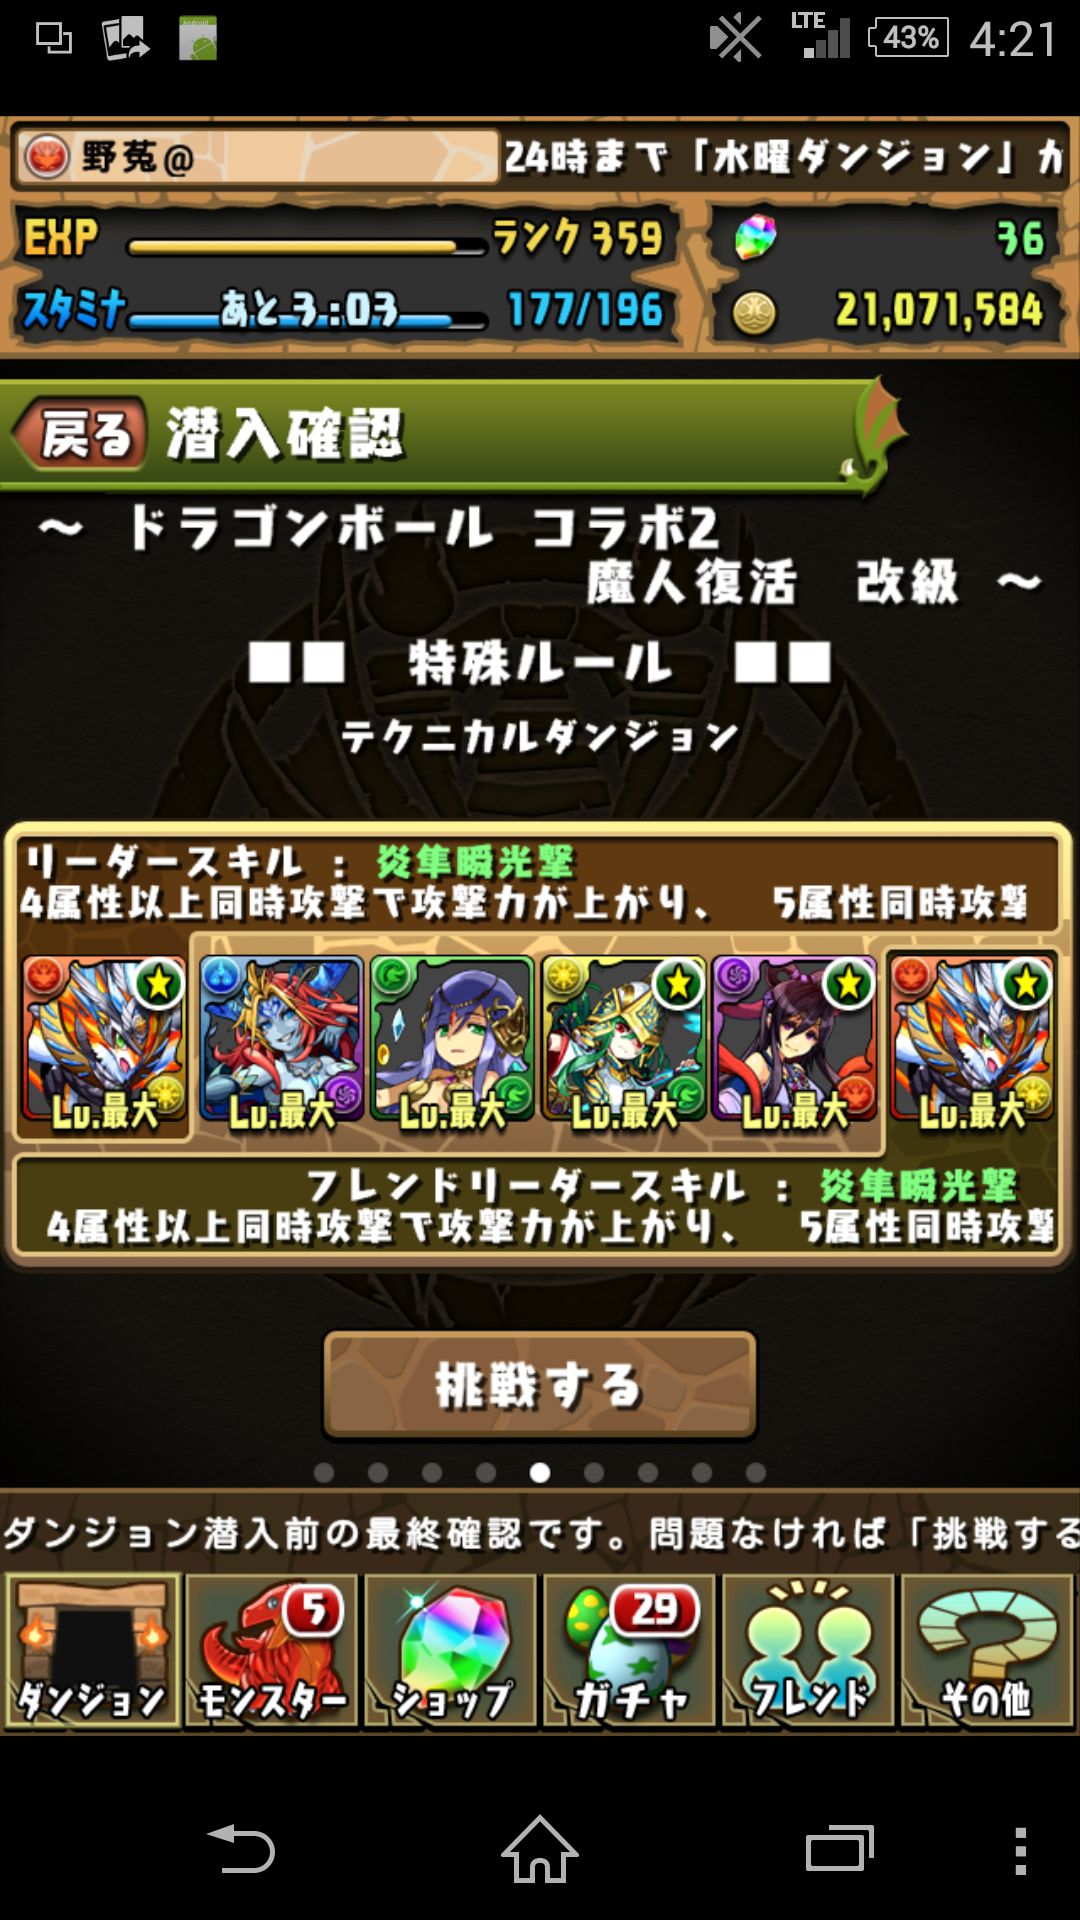 Screenshot_2014-09-24-04-21-57.png